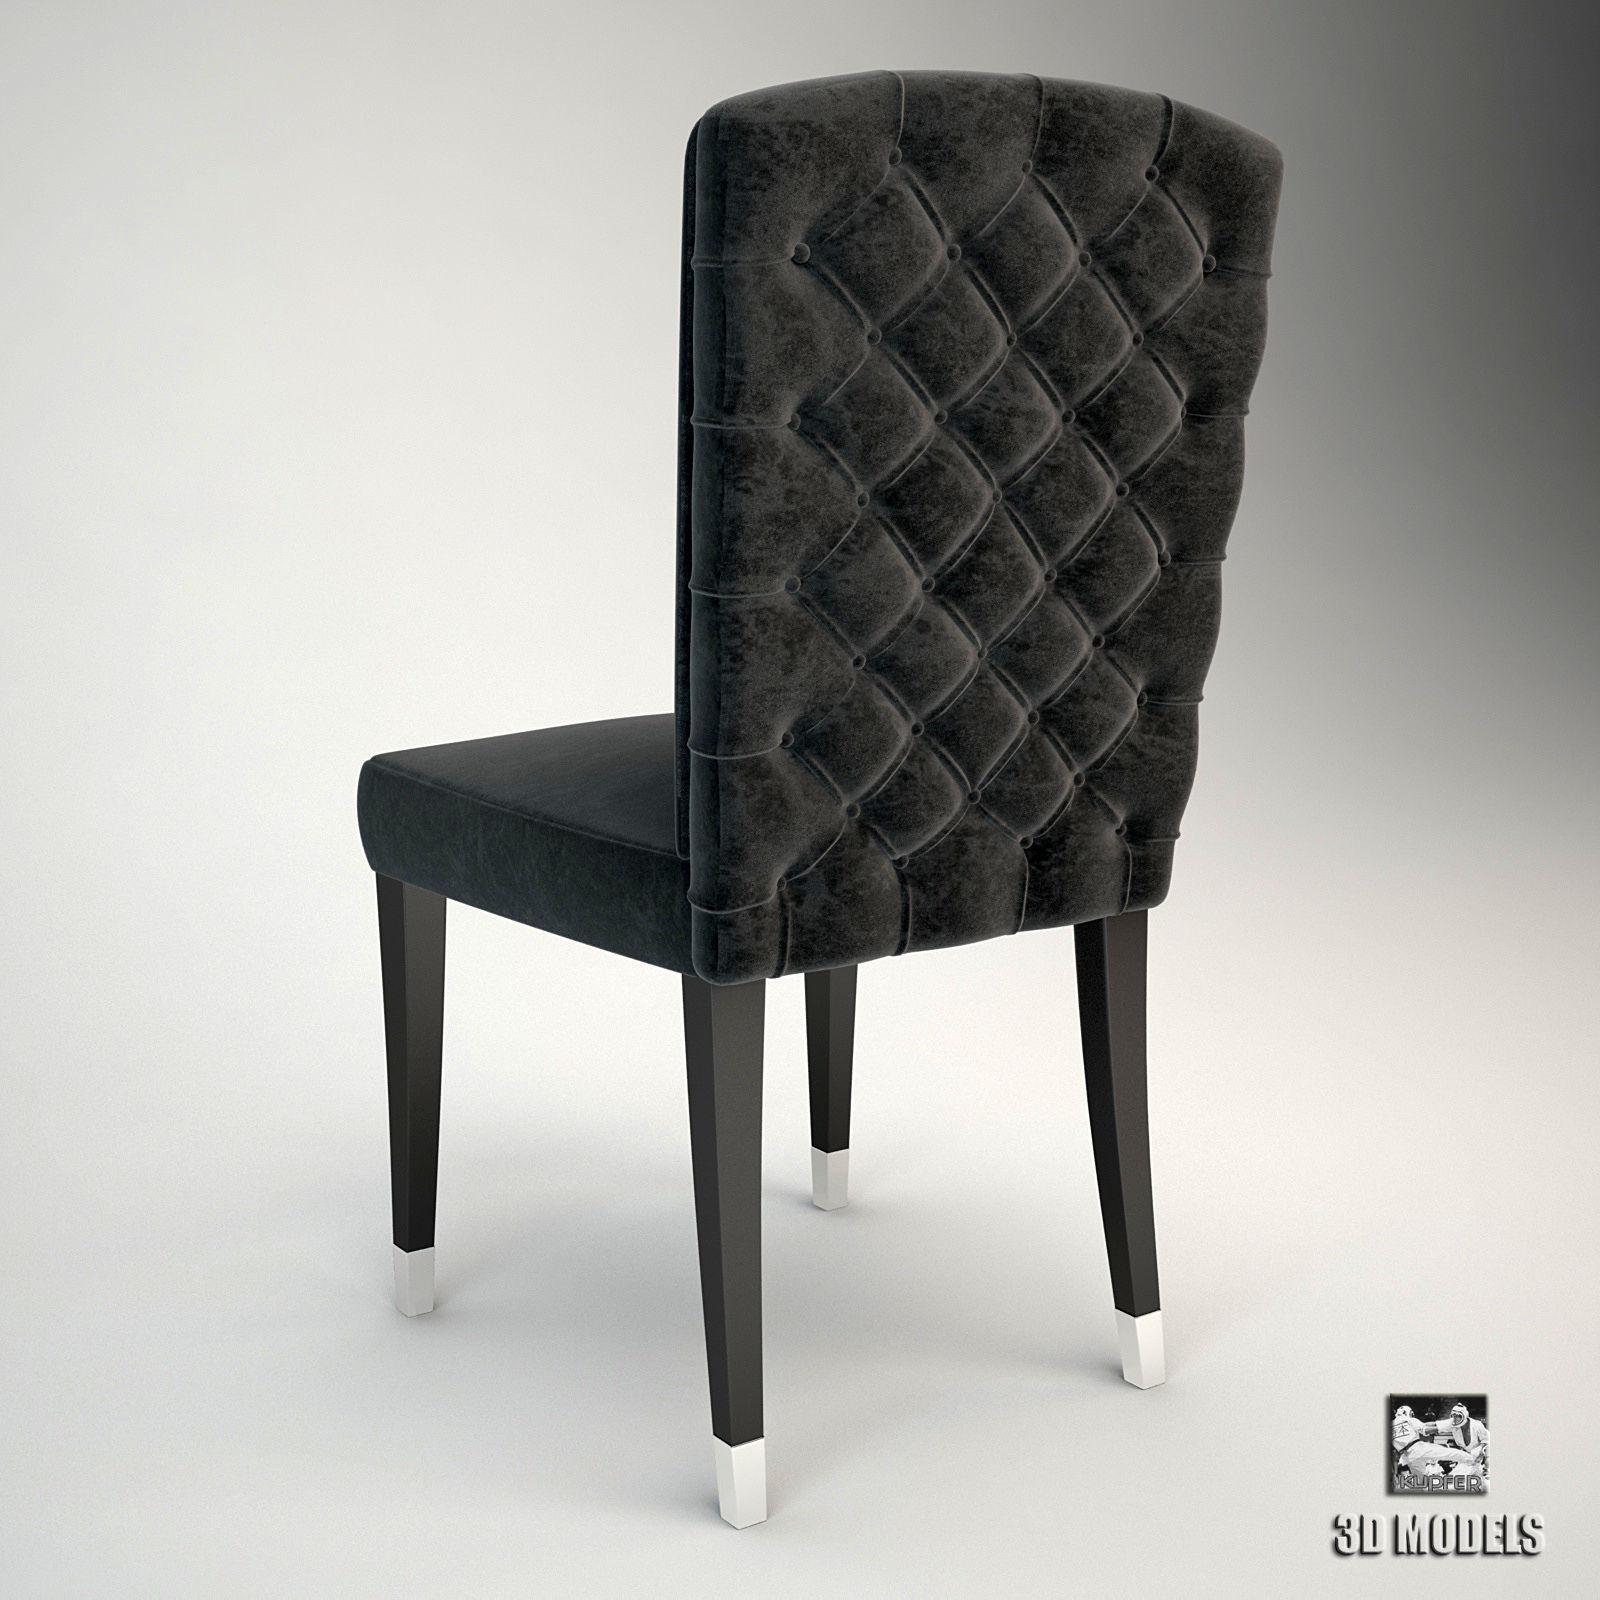 3a1d4f897de6 Fendi casa chair model max obj fbx jpg 1600x1600 Fendi chair